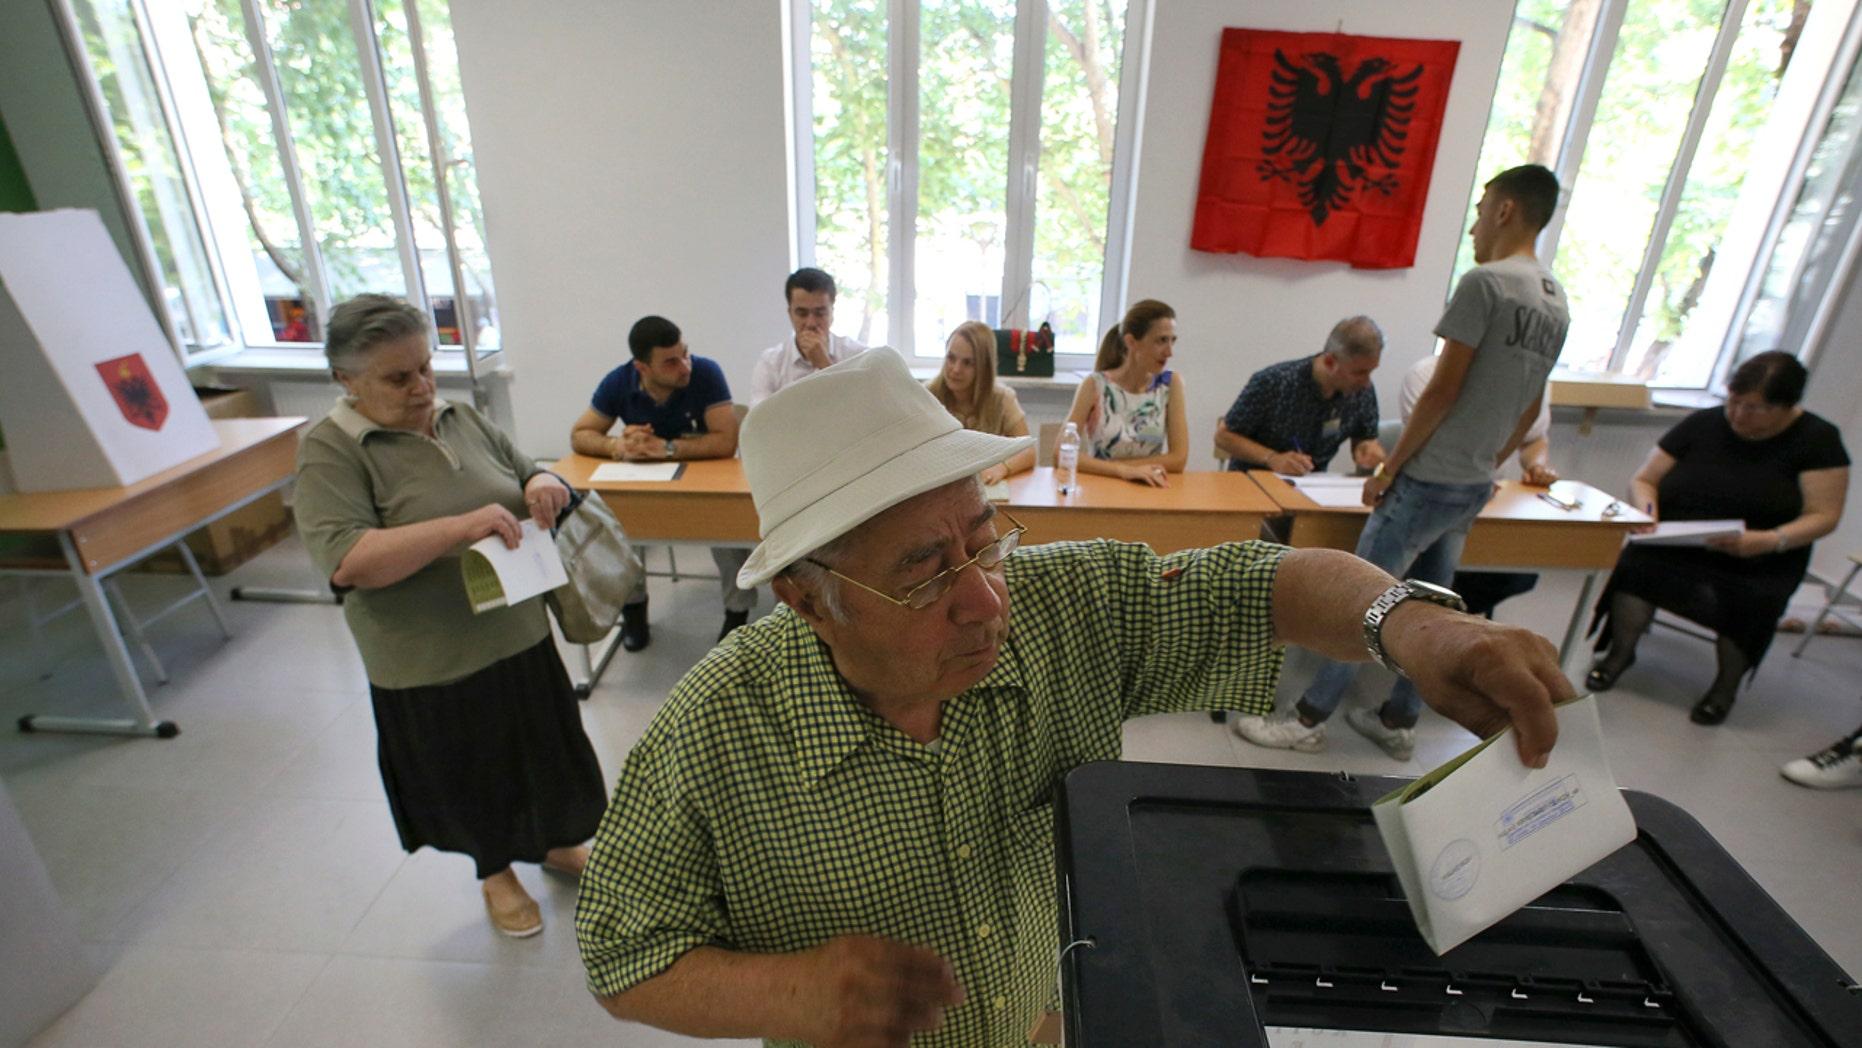 An Albanian man casts his ballot at a polling station in Tirana, Sunday, June 25, 2017.